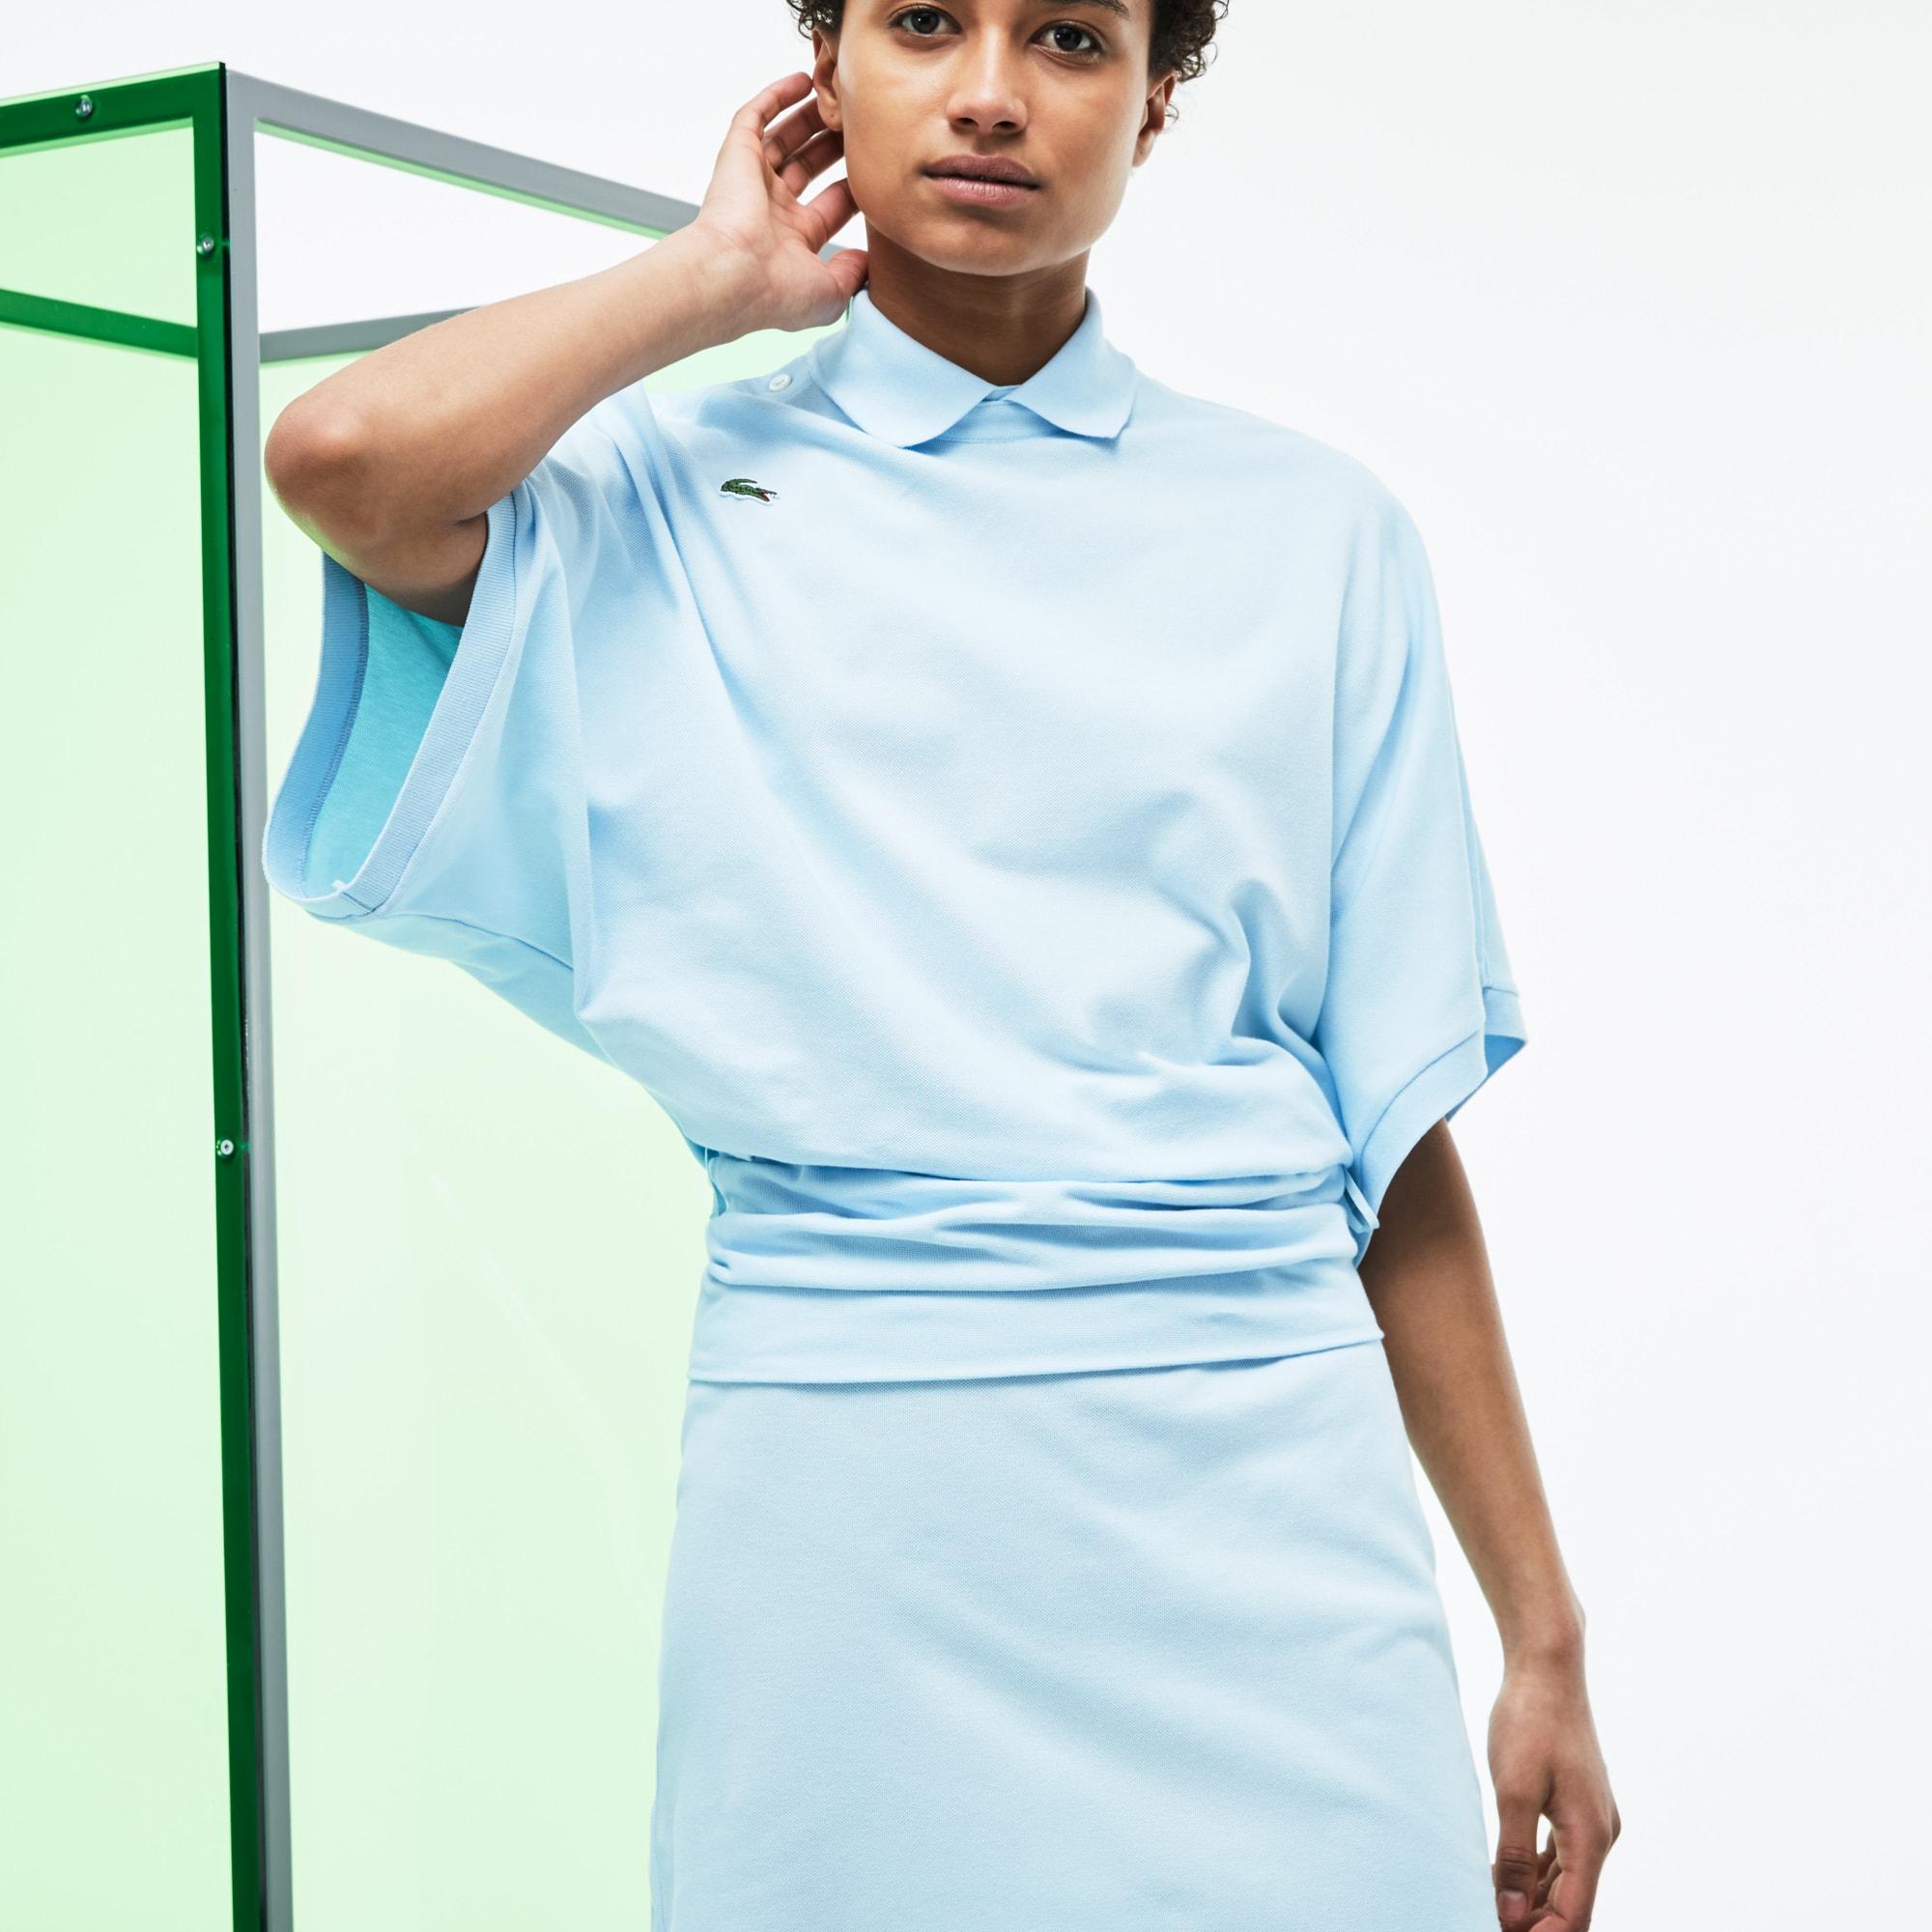 Damen Loose-Fit Poloshirt aus der Fashion Show Kollektion